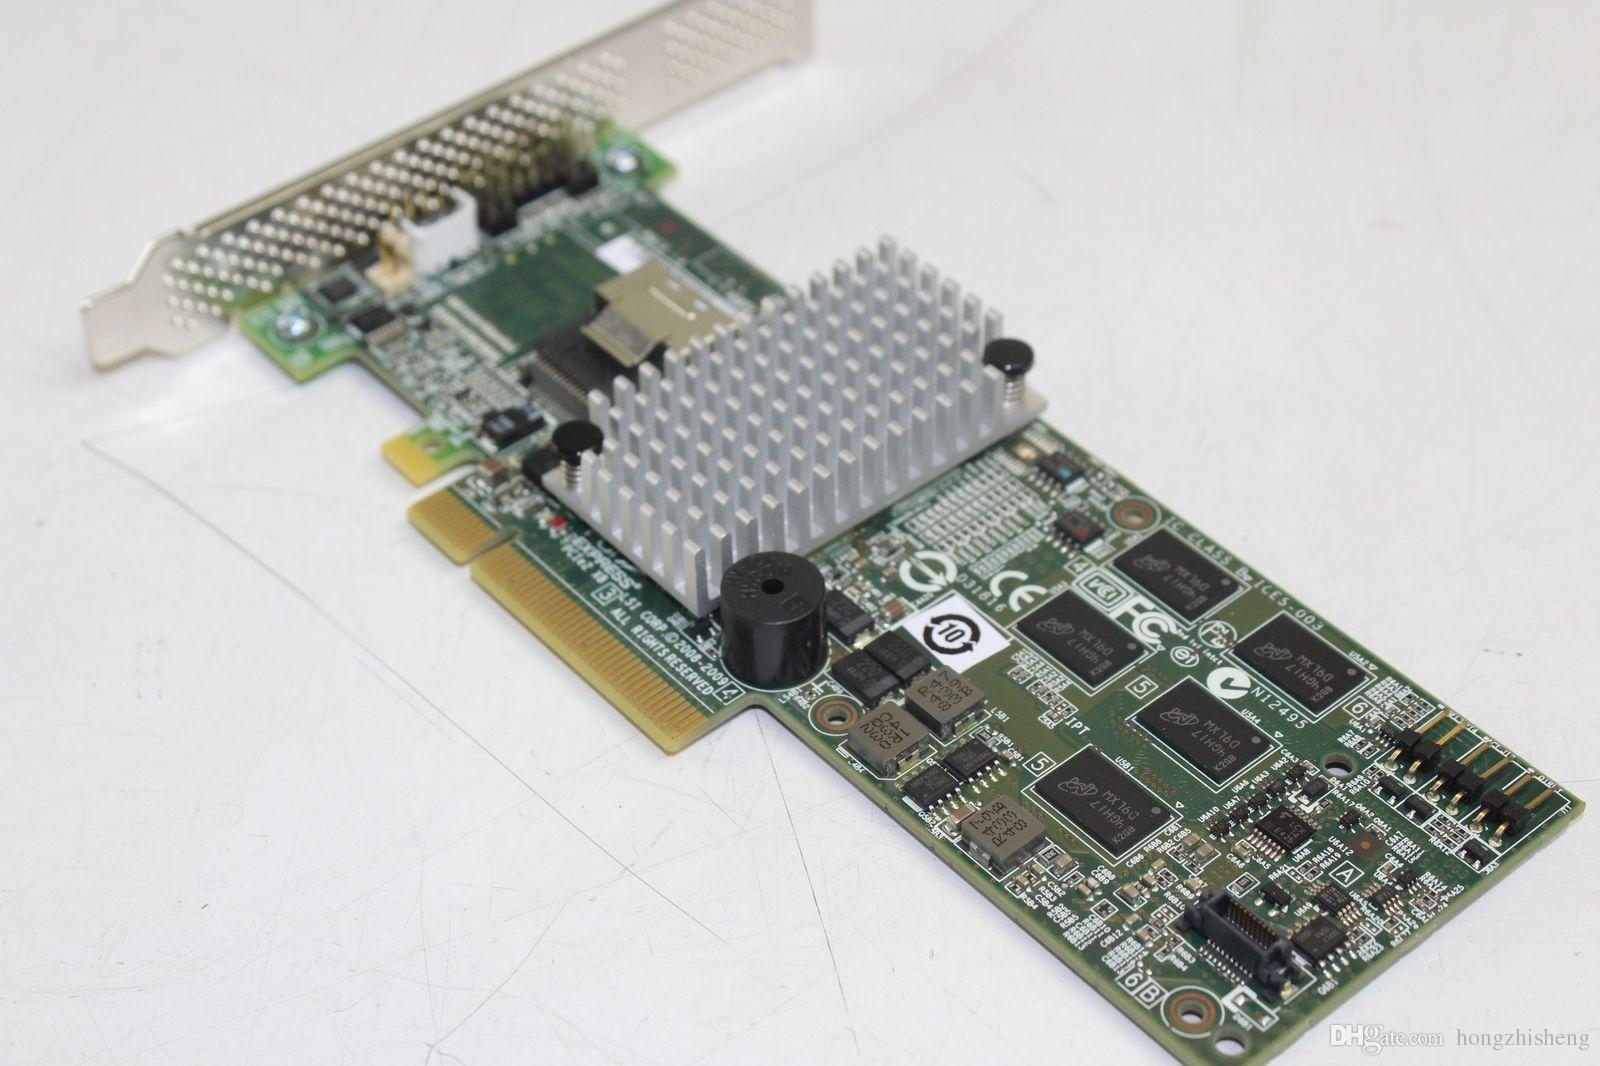 SAS 9260-4I 6 gb Sas Dizi Kart endüstriyel anakart 100% test mükemmel kalite